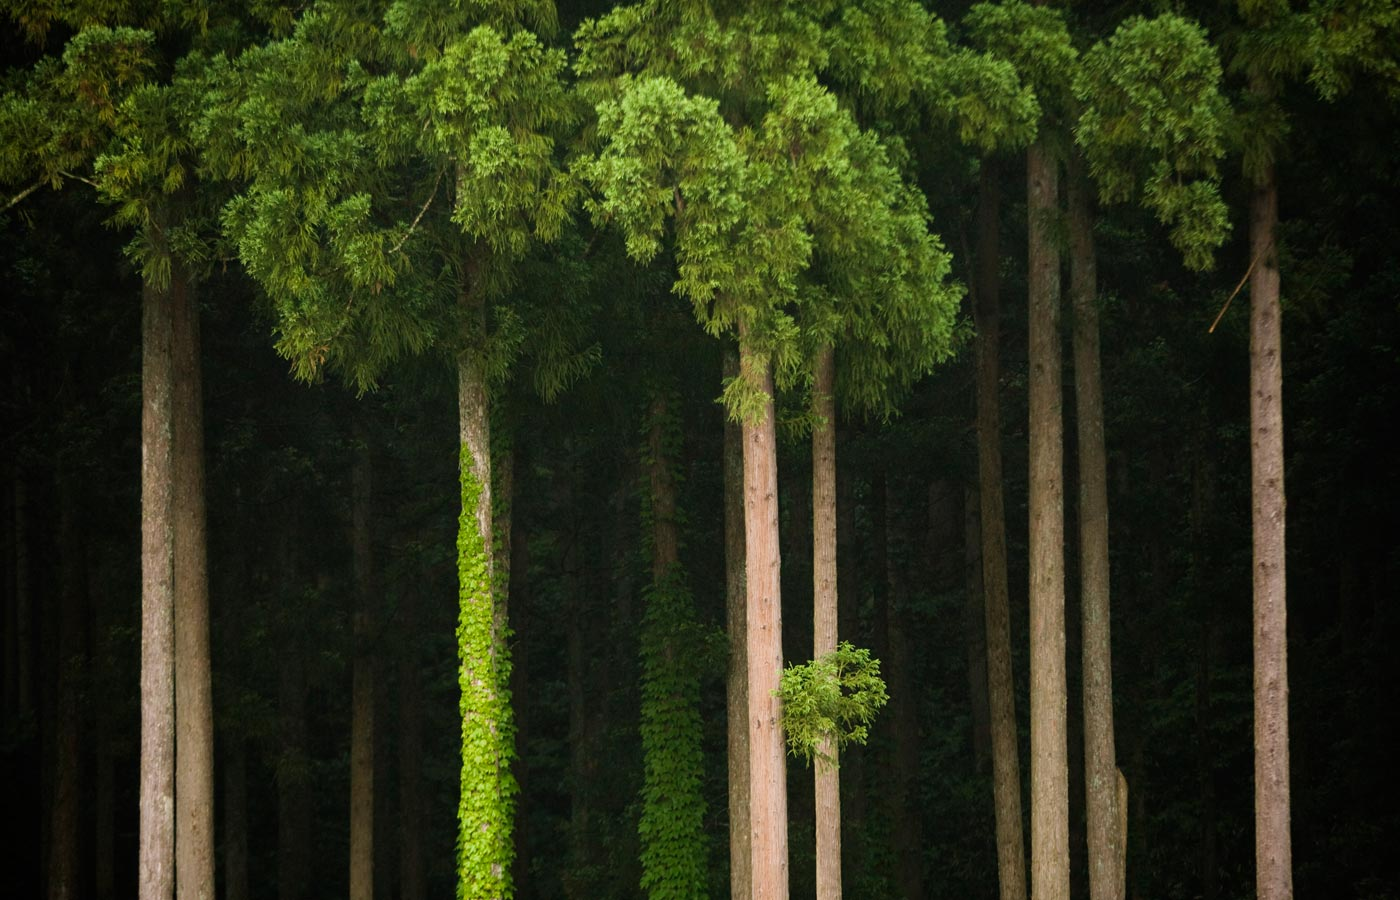 wpid-trees-by-google-2011-10-9-11-42.jpg